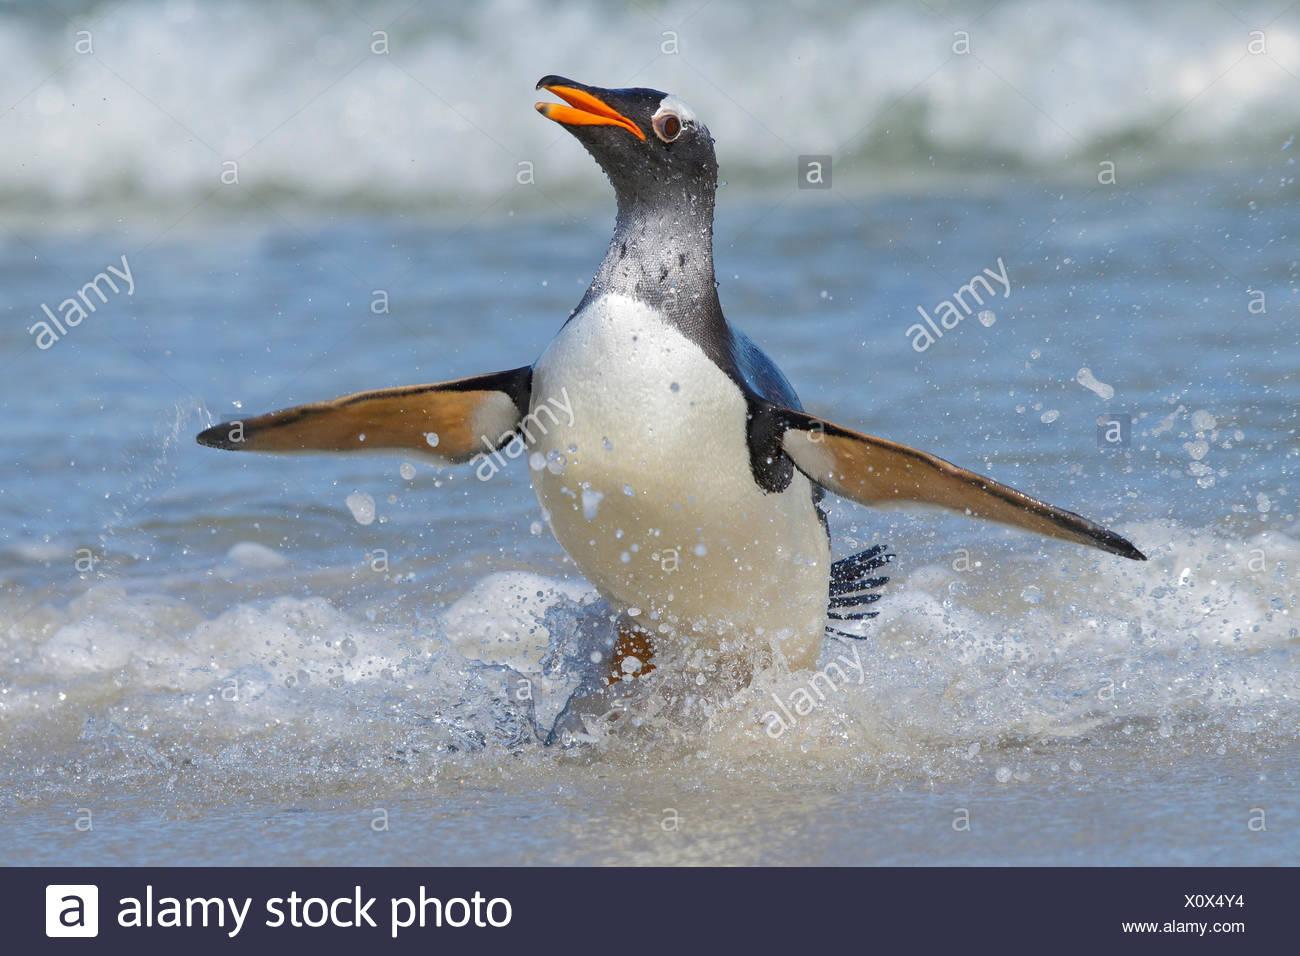 Gentoo Penguin (Pygoscelis papua) along the shoreline in the Falkland Islands. - Stock Image